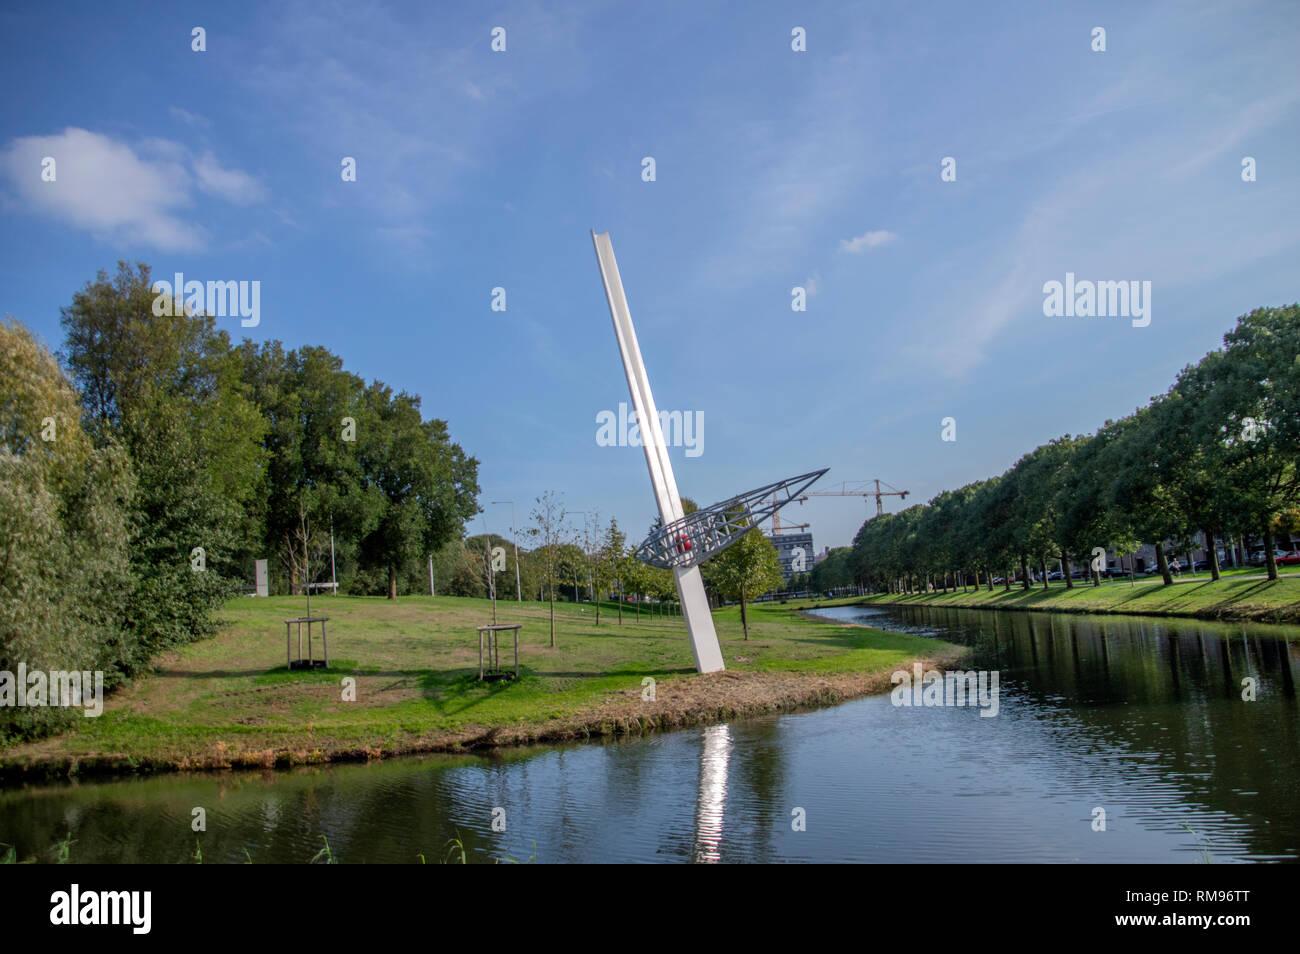 Zonder Titel di cotta statua a Amsterdam Paesi Bassi 2018 Immagini Stock